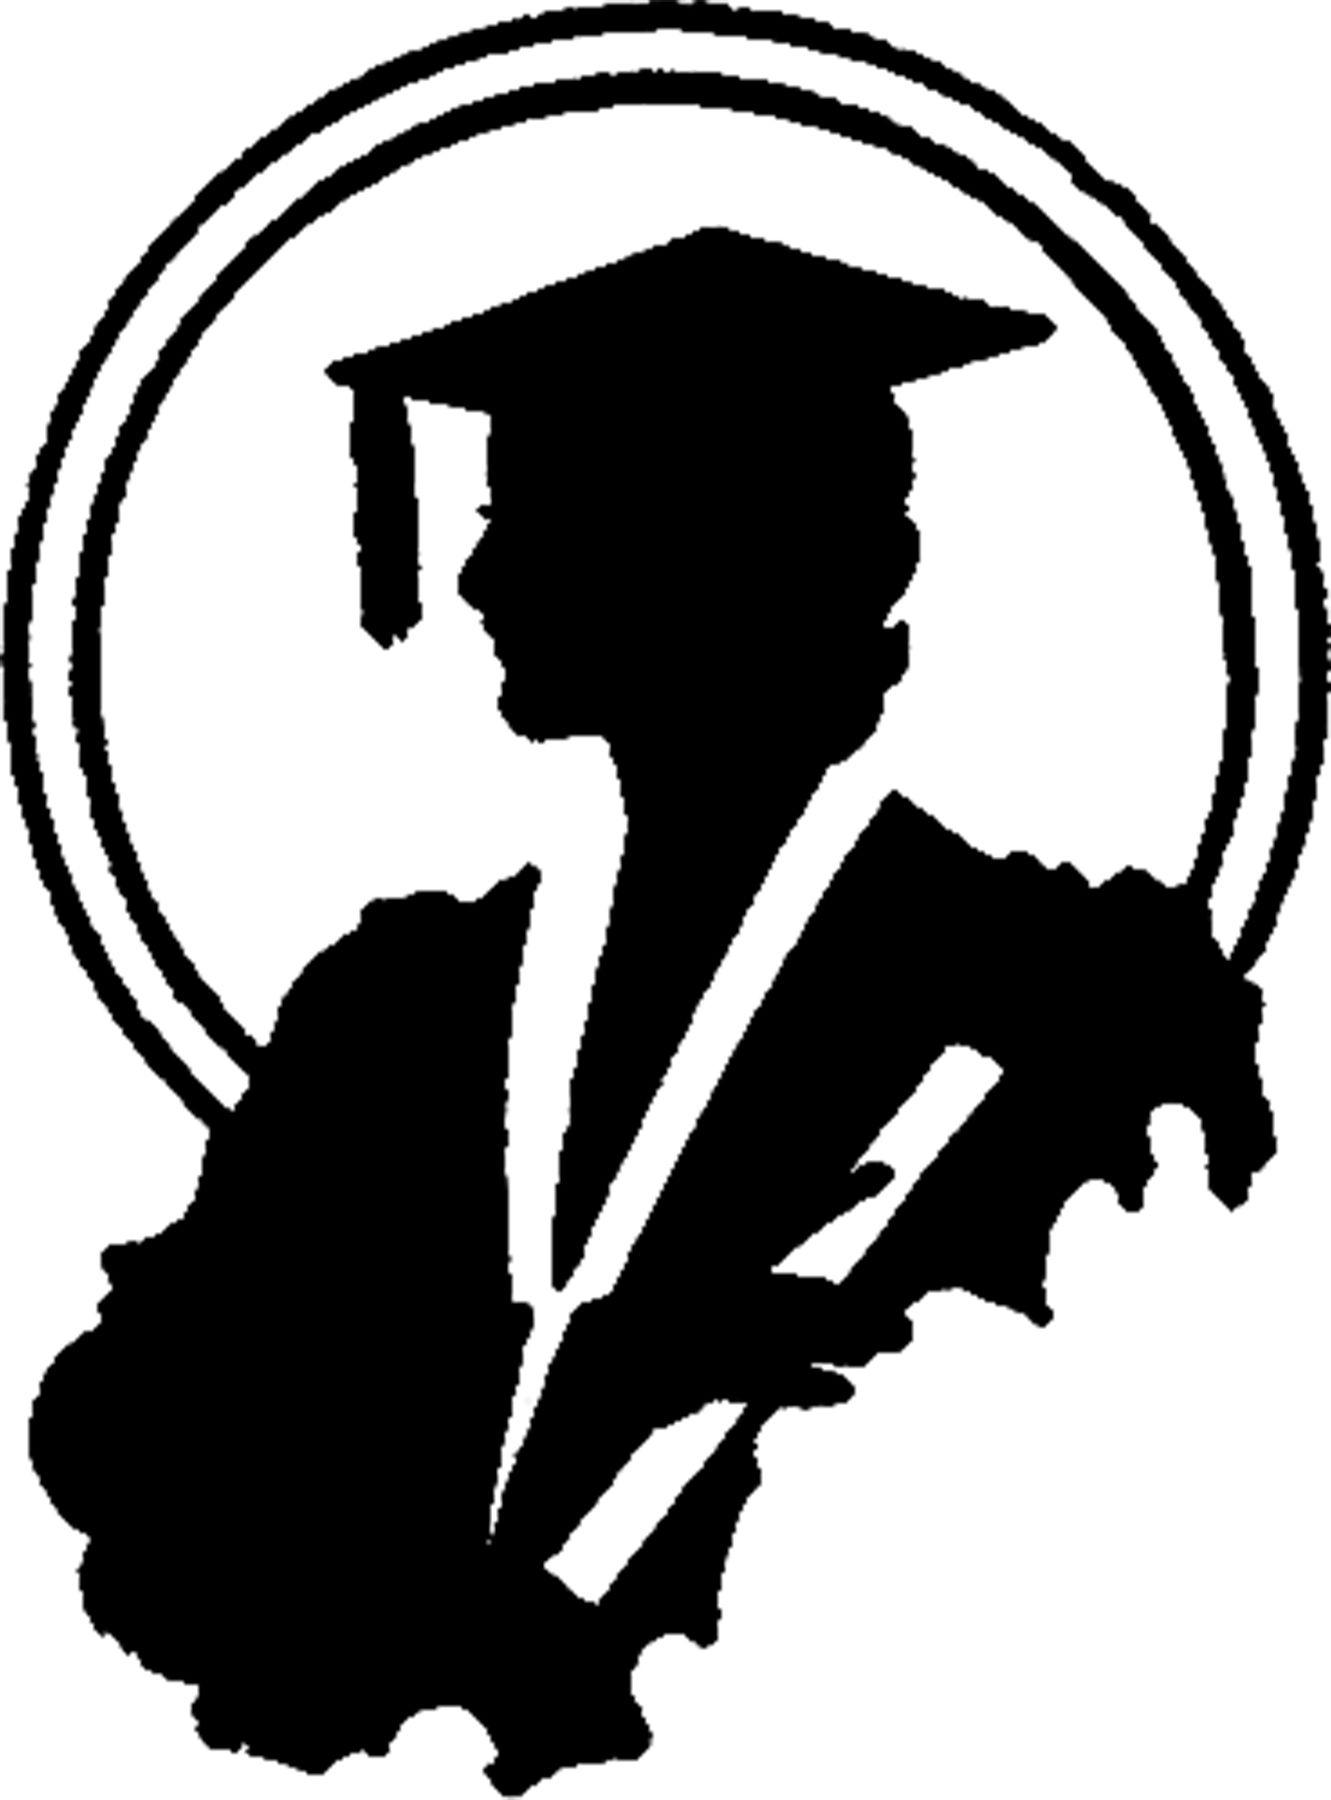 Graduation-Silhouette-Girl-Image-GraphicsFairy.jpg (1331×1800)